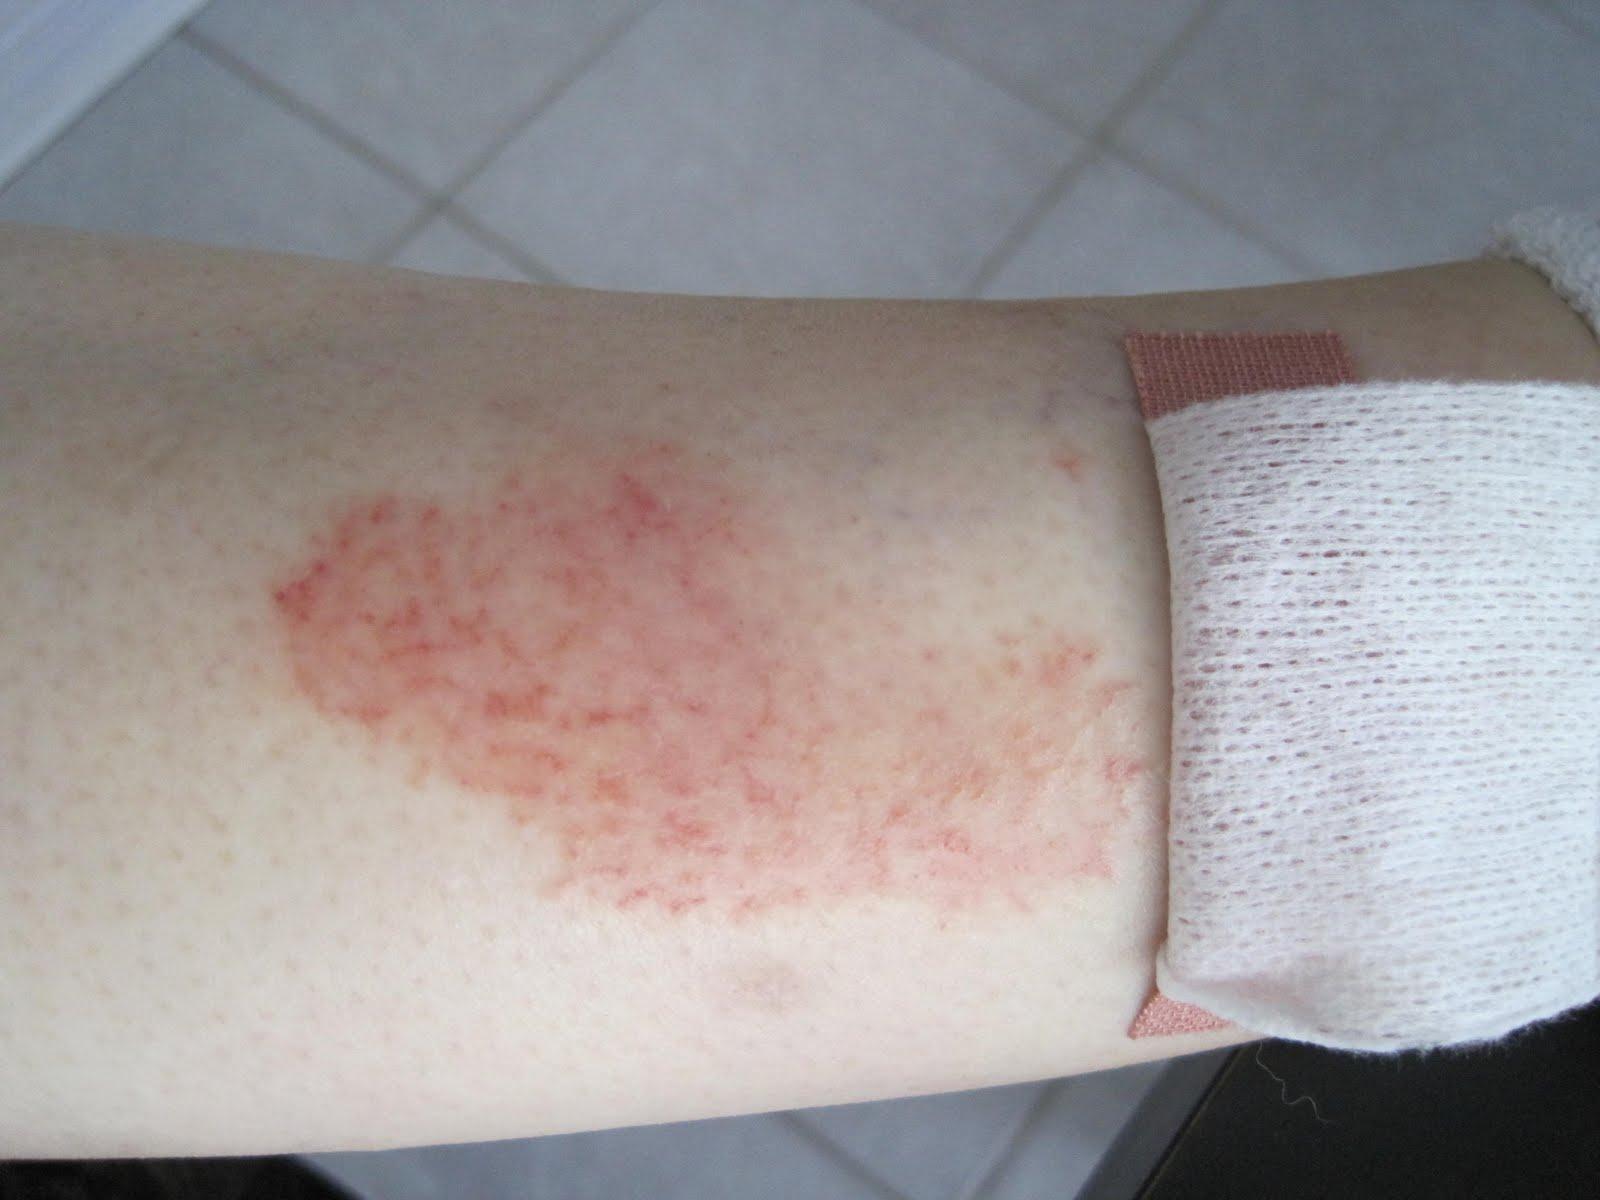 eczema on shins - photo #18